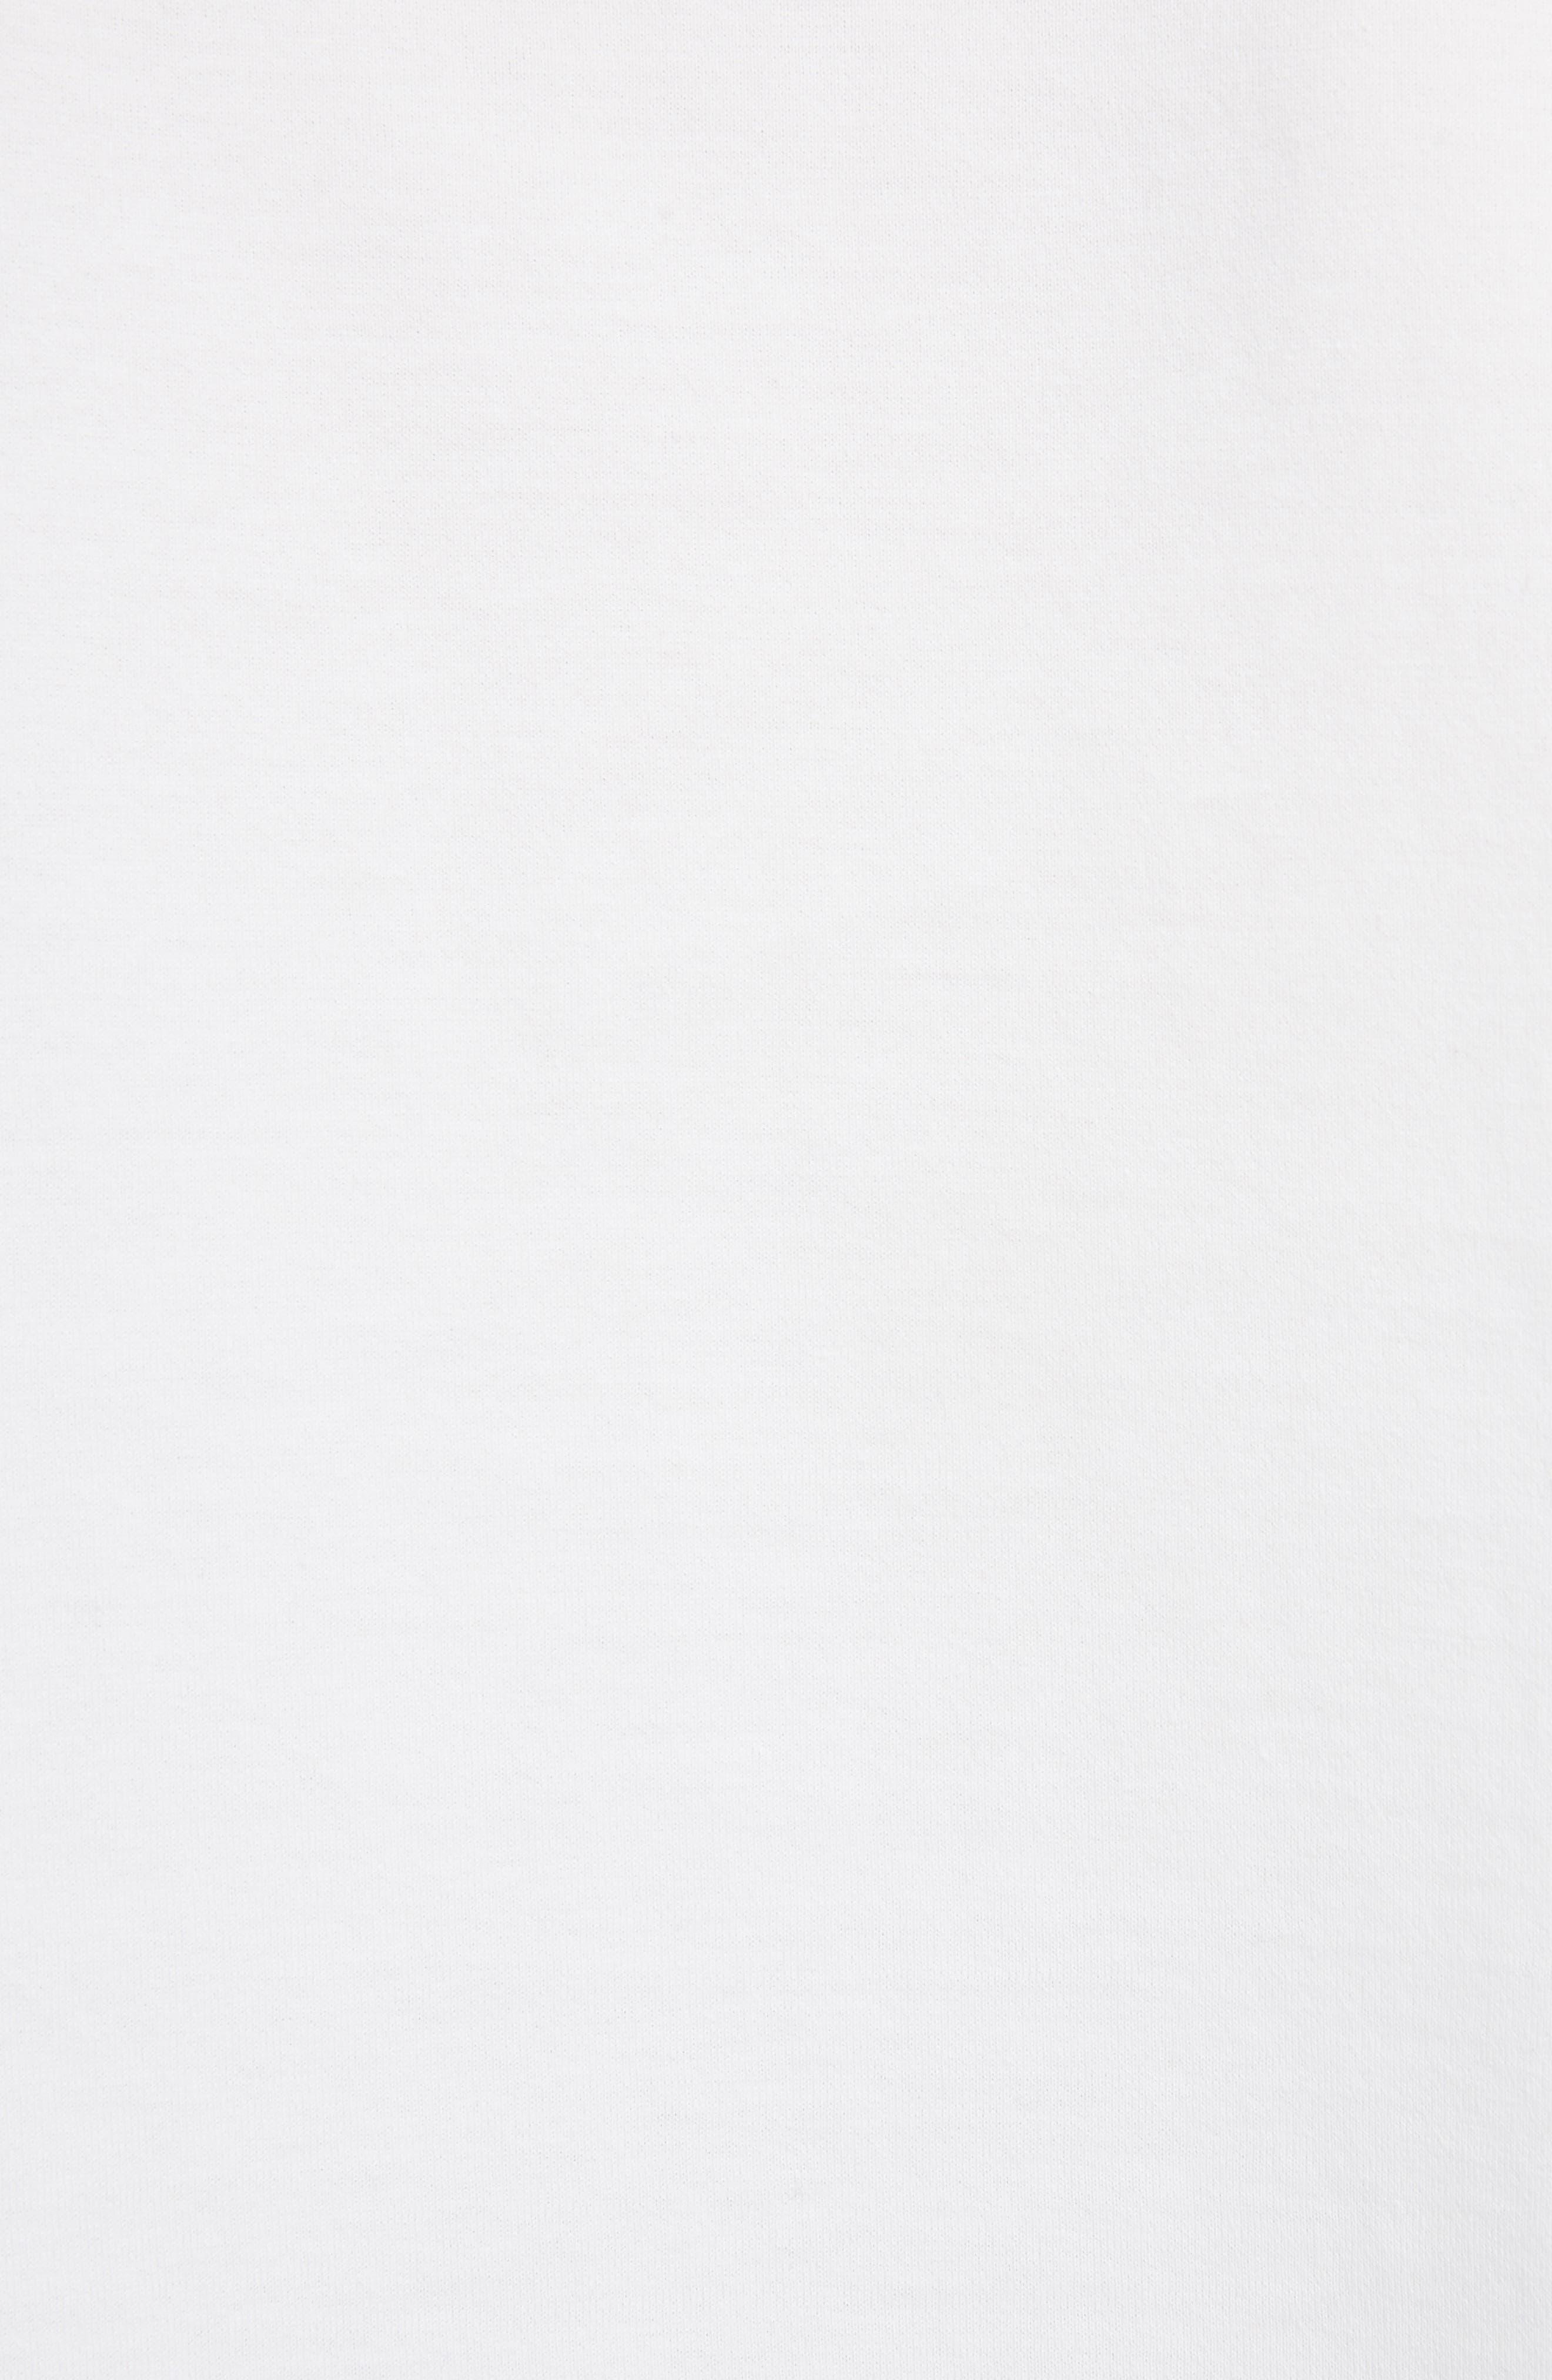 Marwig Boxy Tee,                             Alternate thumbnail 5, color,                             Optic White